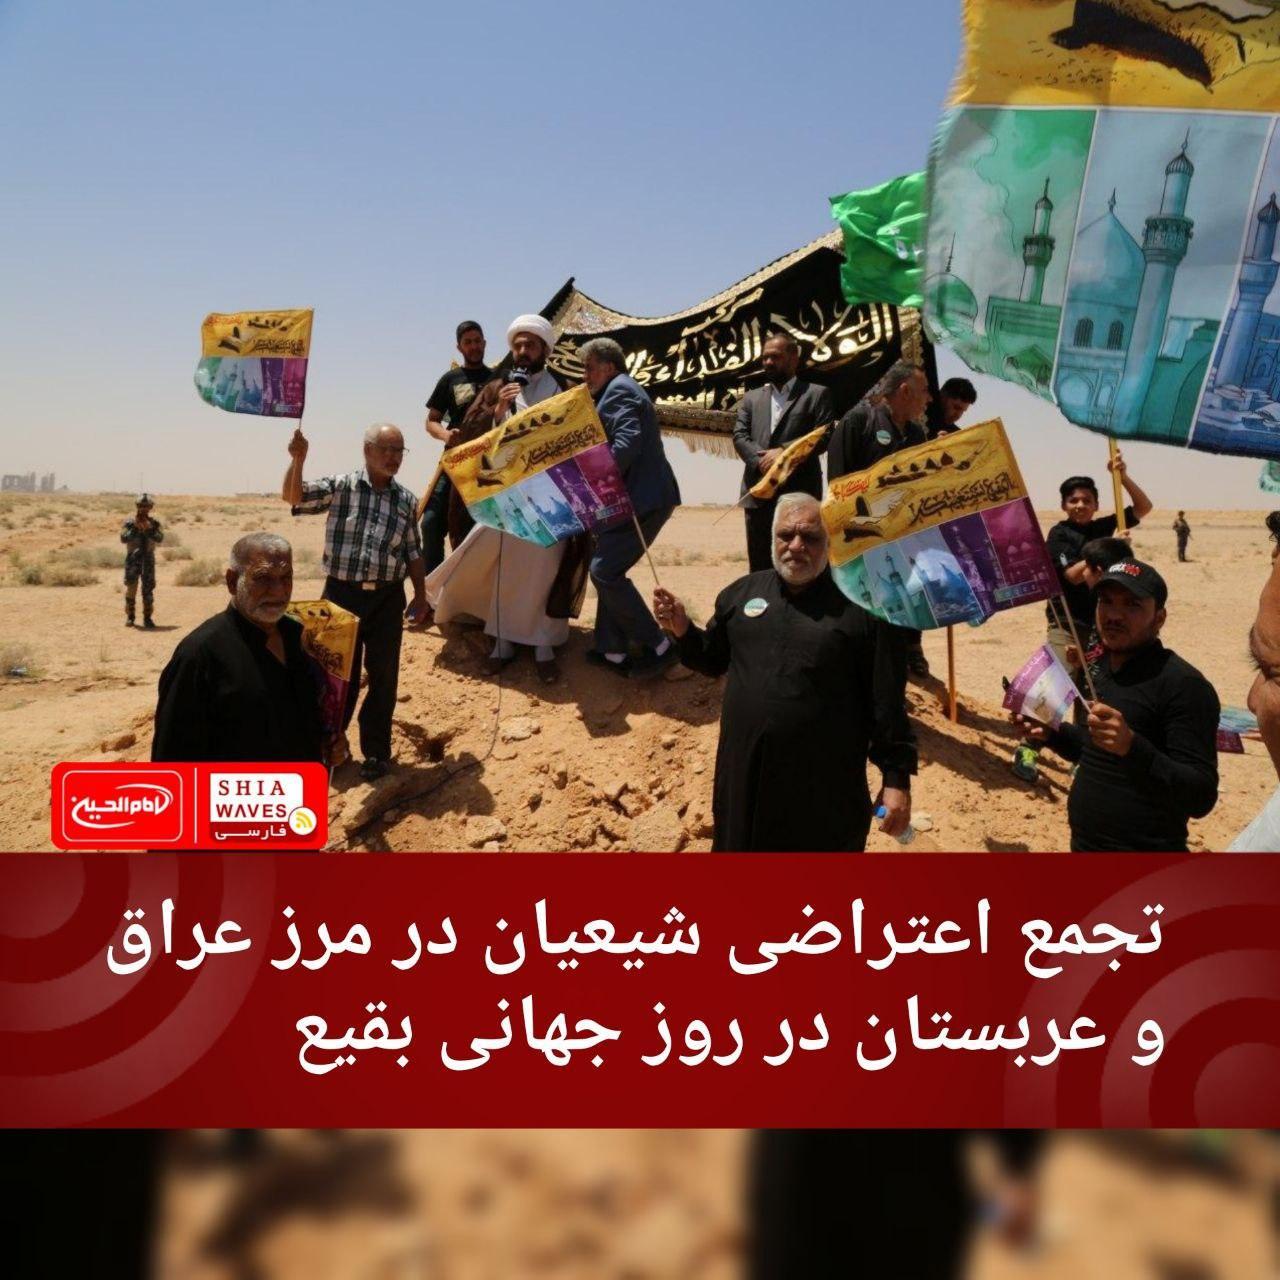 Photo of تجمع اعتراضی شیعیان در مرز عراق و عربستان در روز جهانی بقیع